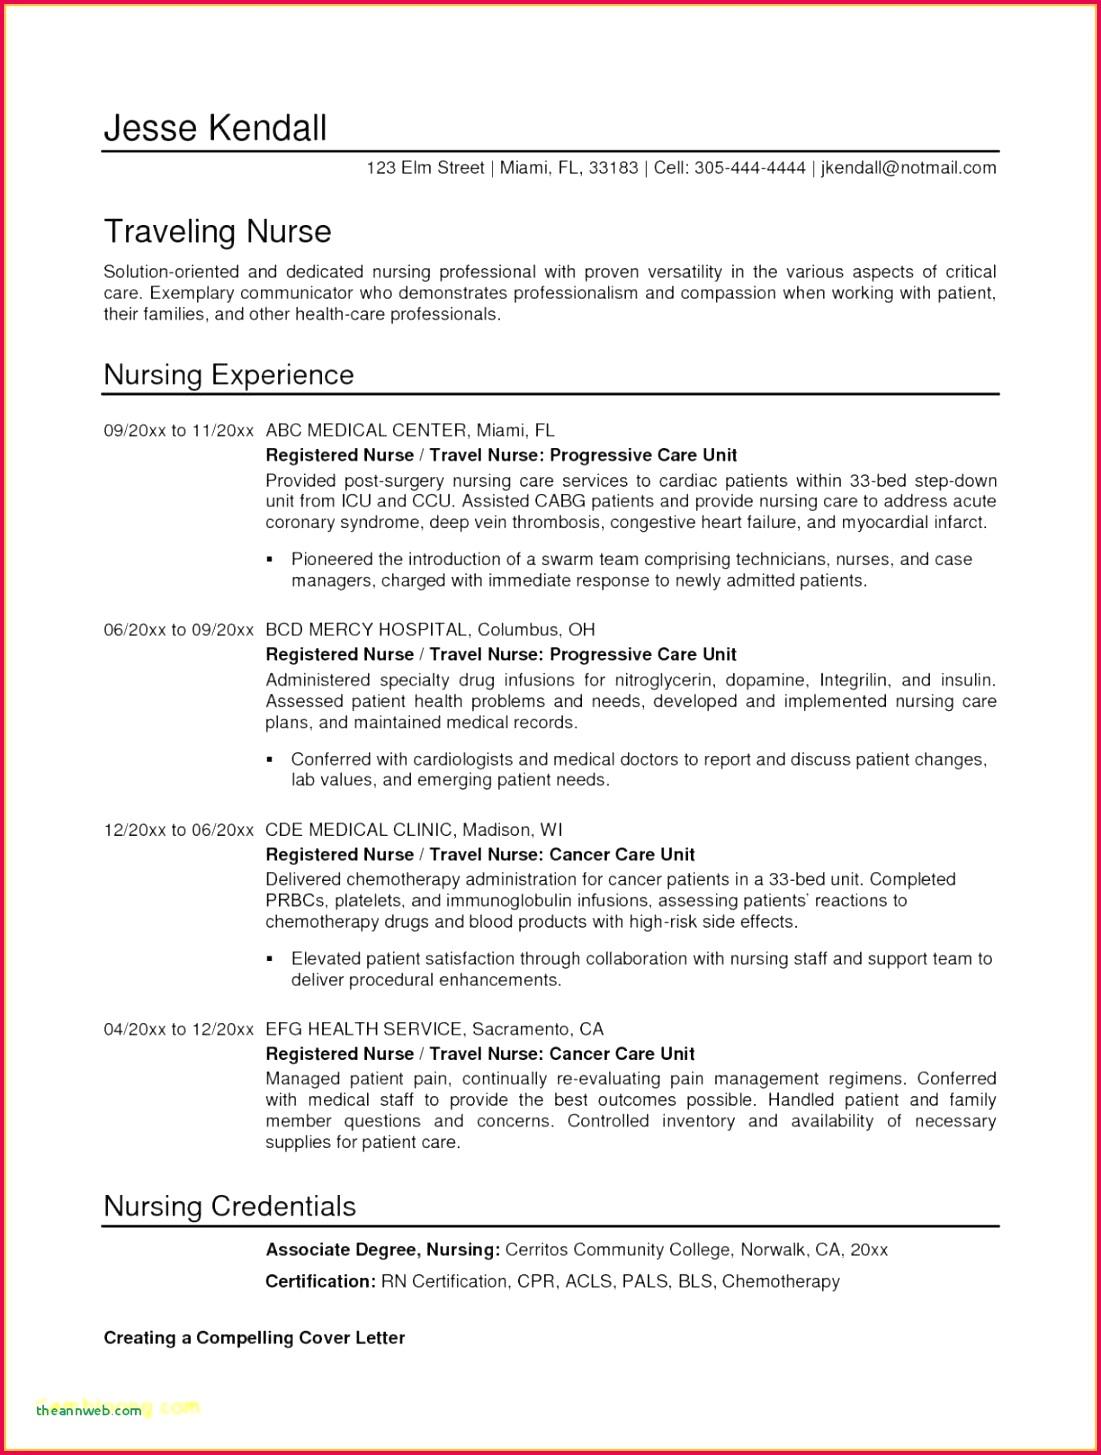 resume examples with associates degree unique photos resume questions certificate conformance template magnificent resume of resume examples with associates degree